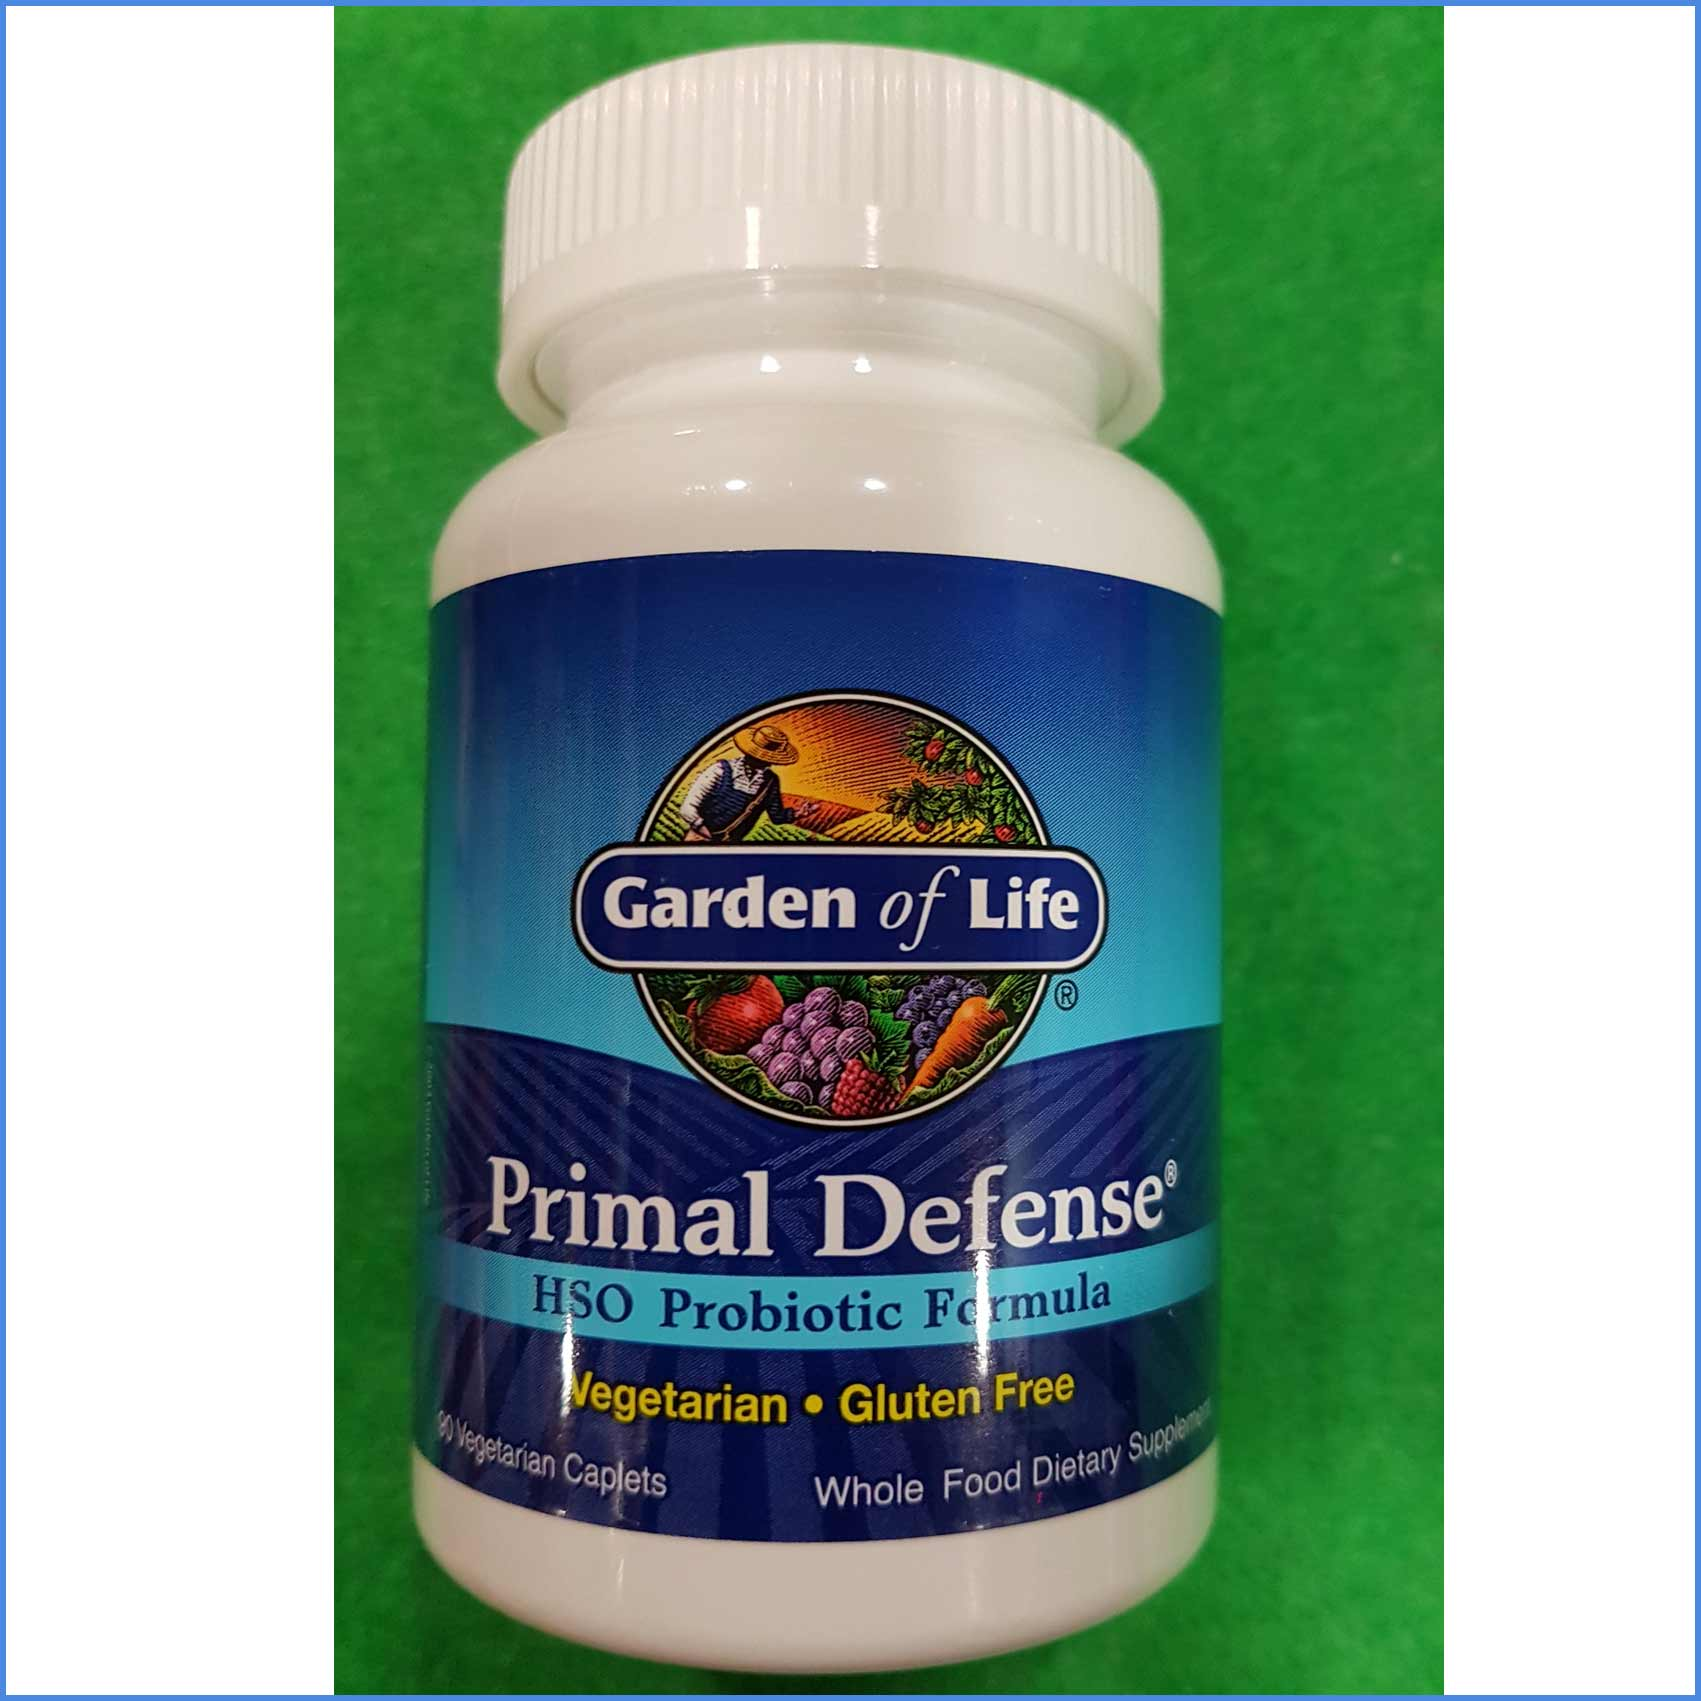 Primal Defense Probiotic